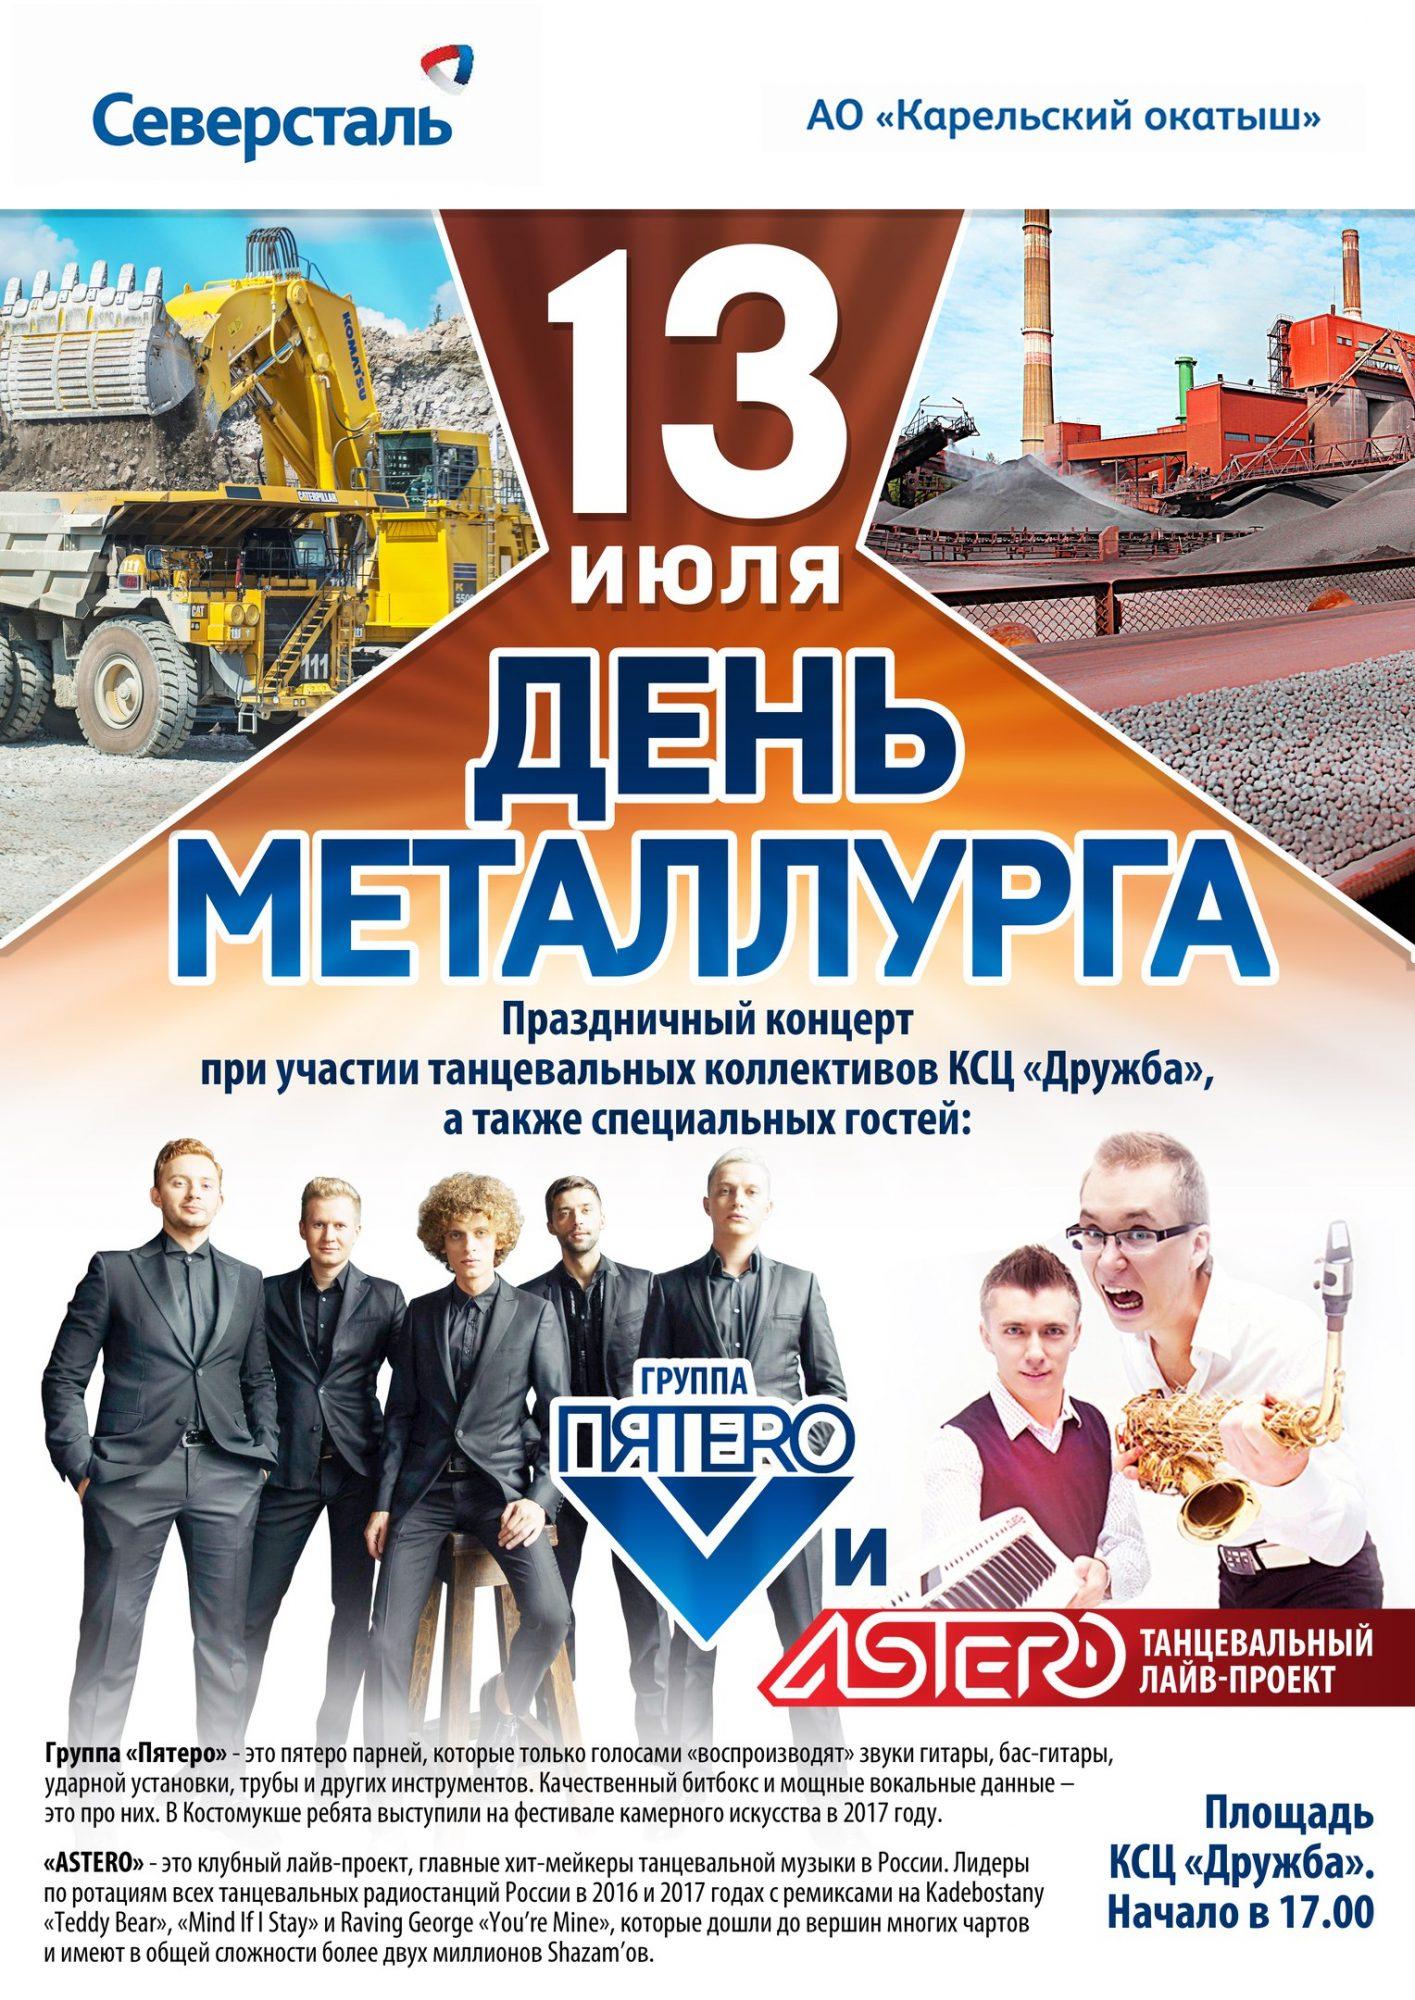 День металлурга группа ПЯТЕRО